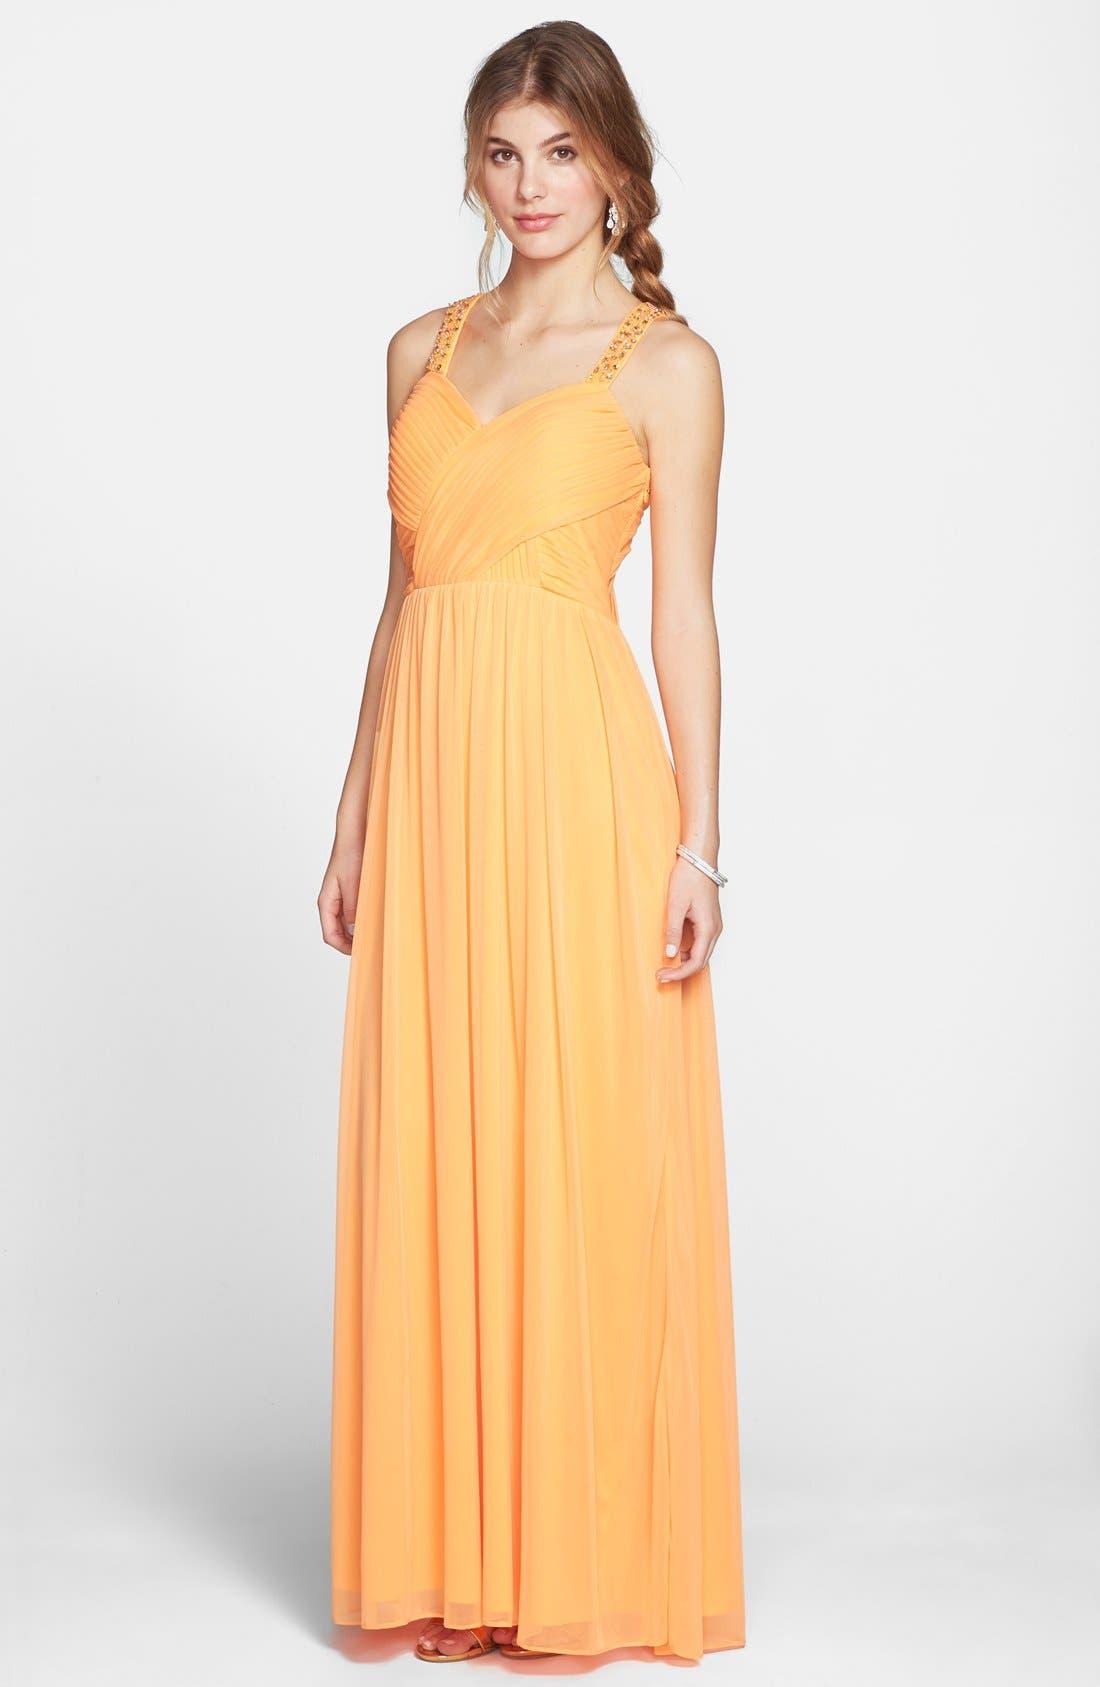 Main Image - Hailey Logan 'Tina' Cutout Embellished Gown (Juniors)